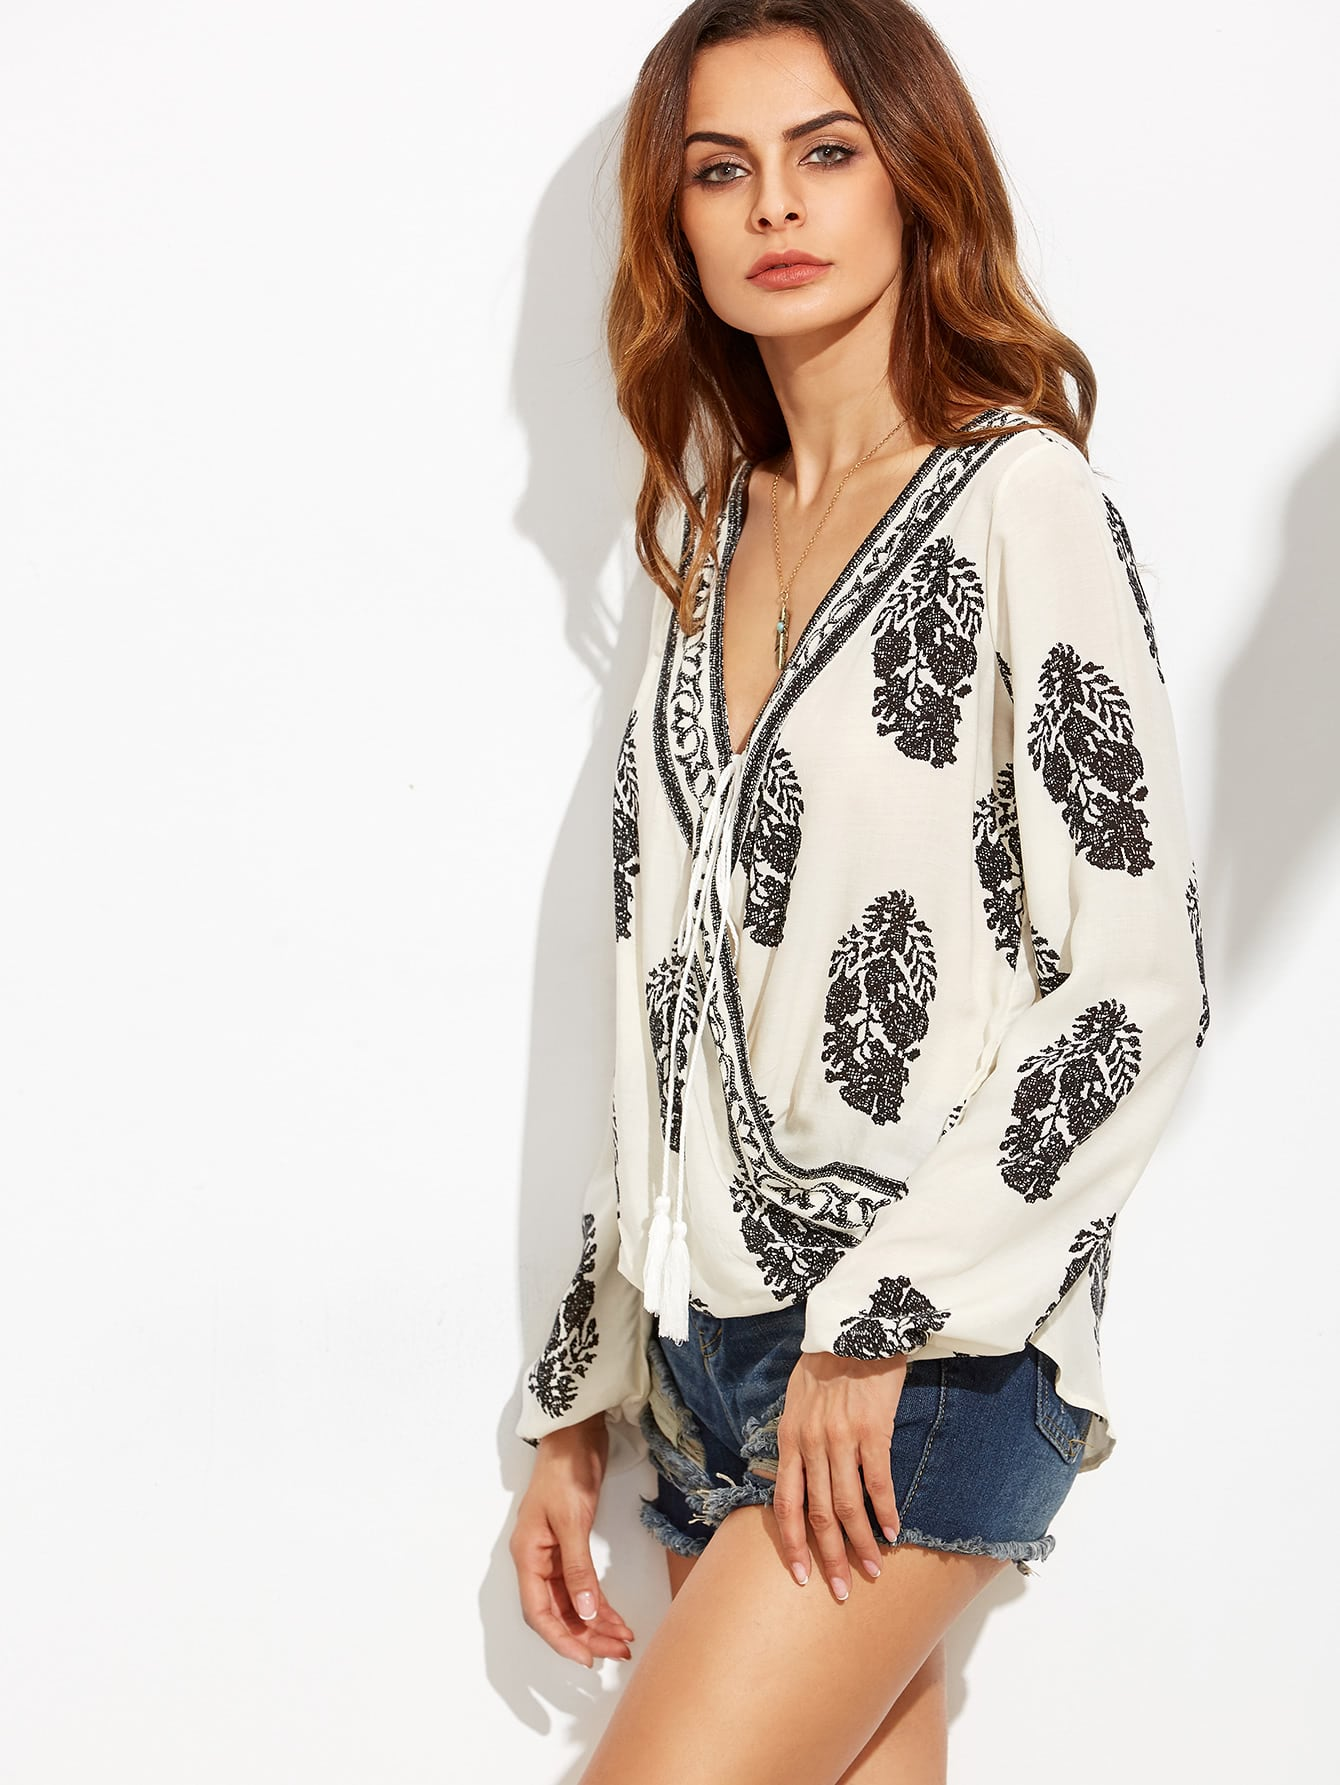 blouse160808004_2